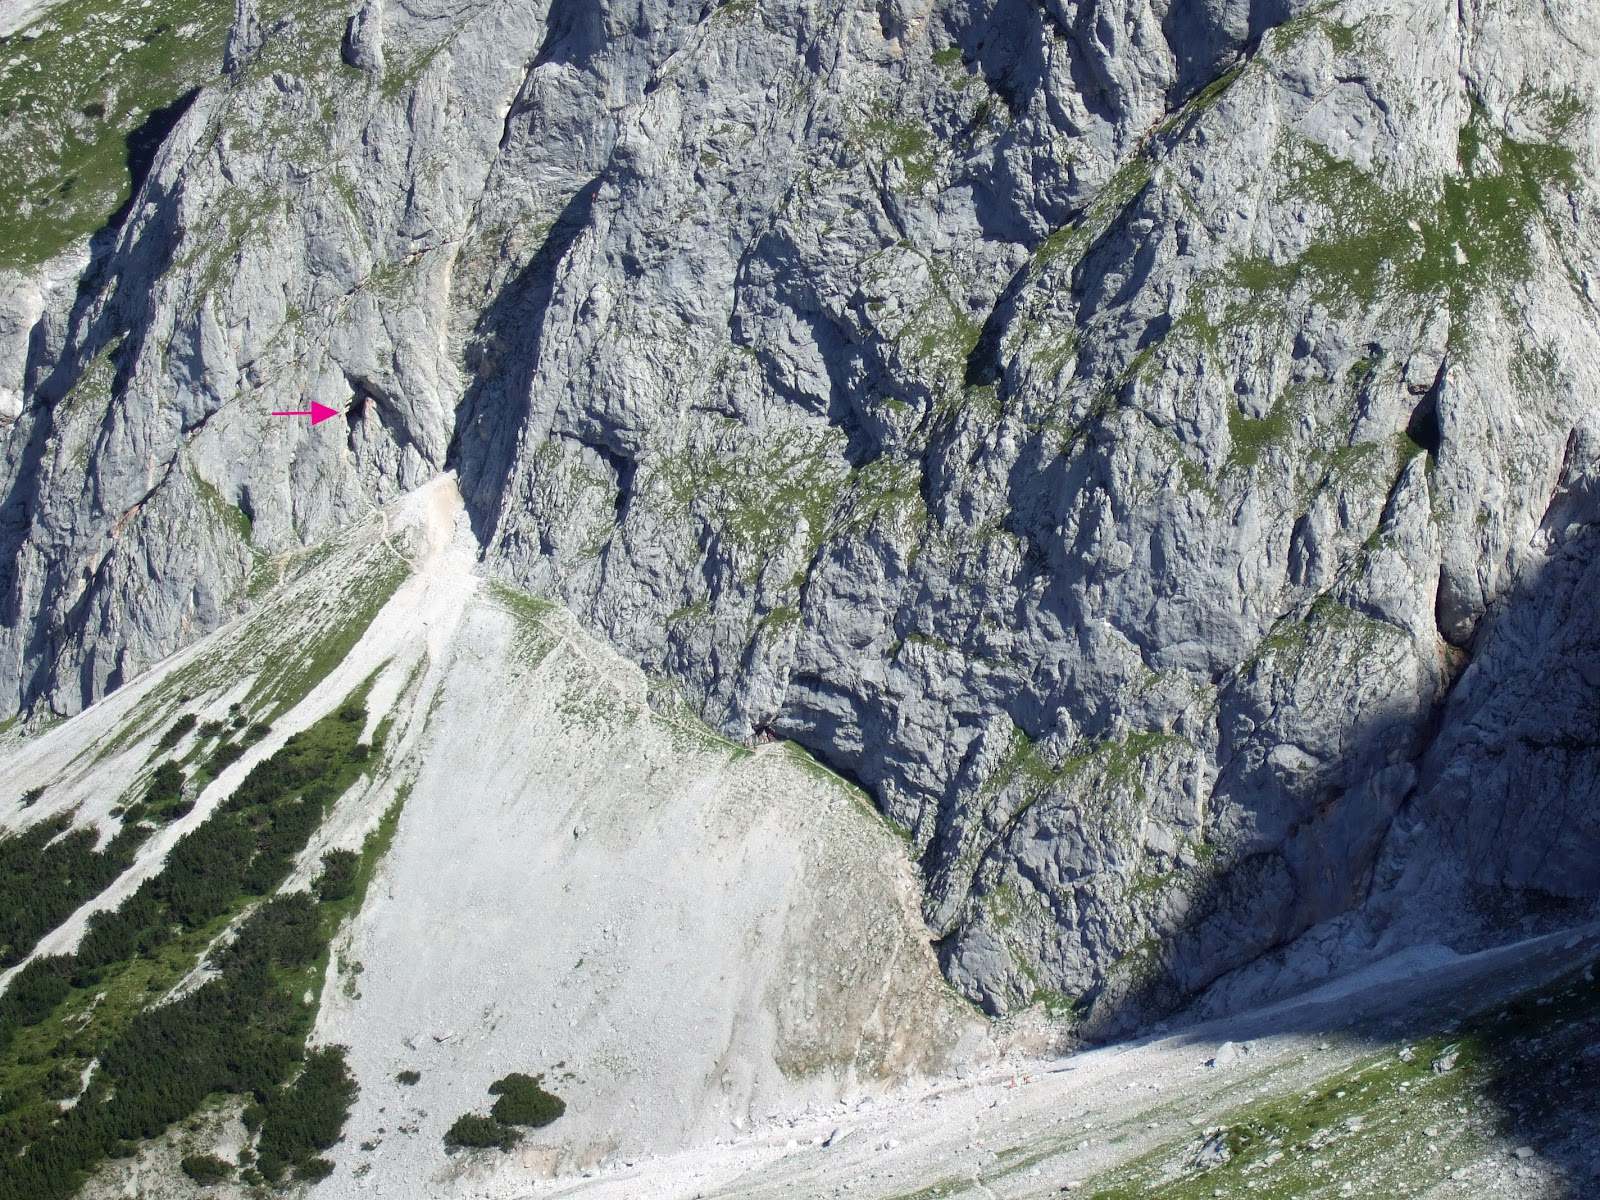 wuppertal-aktiv: Speleo Austria 2012 - Teil 2